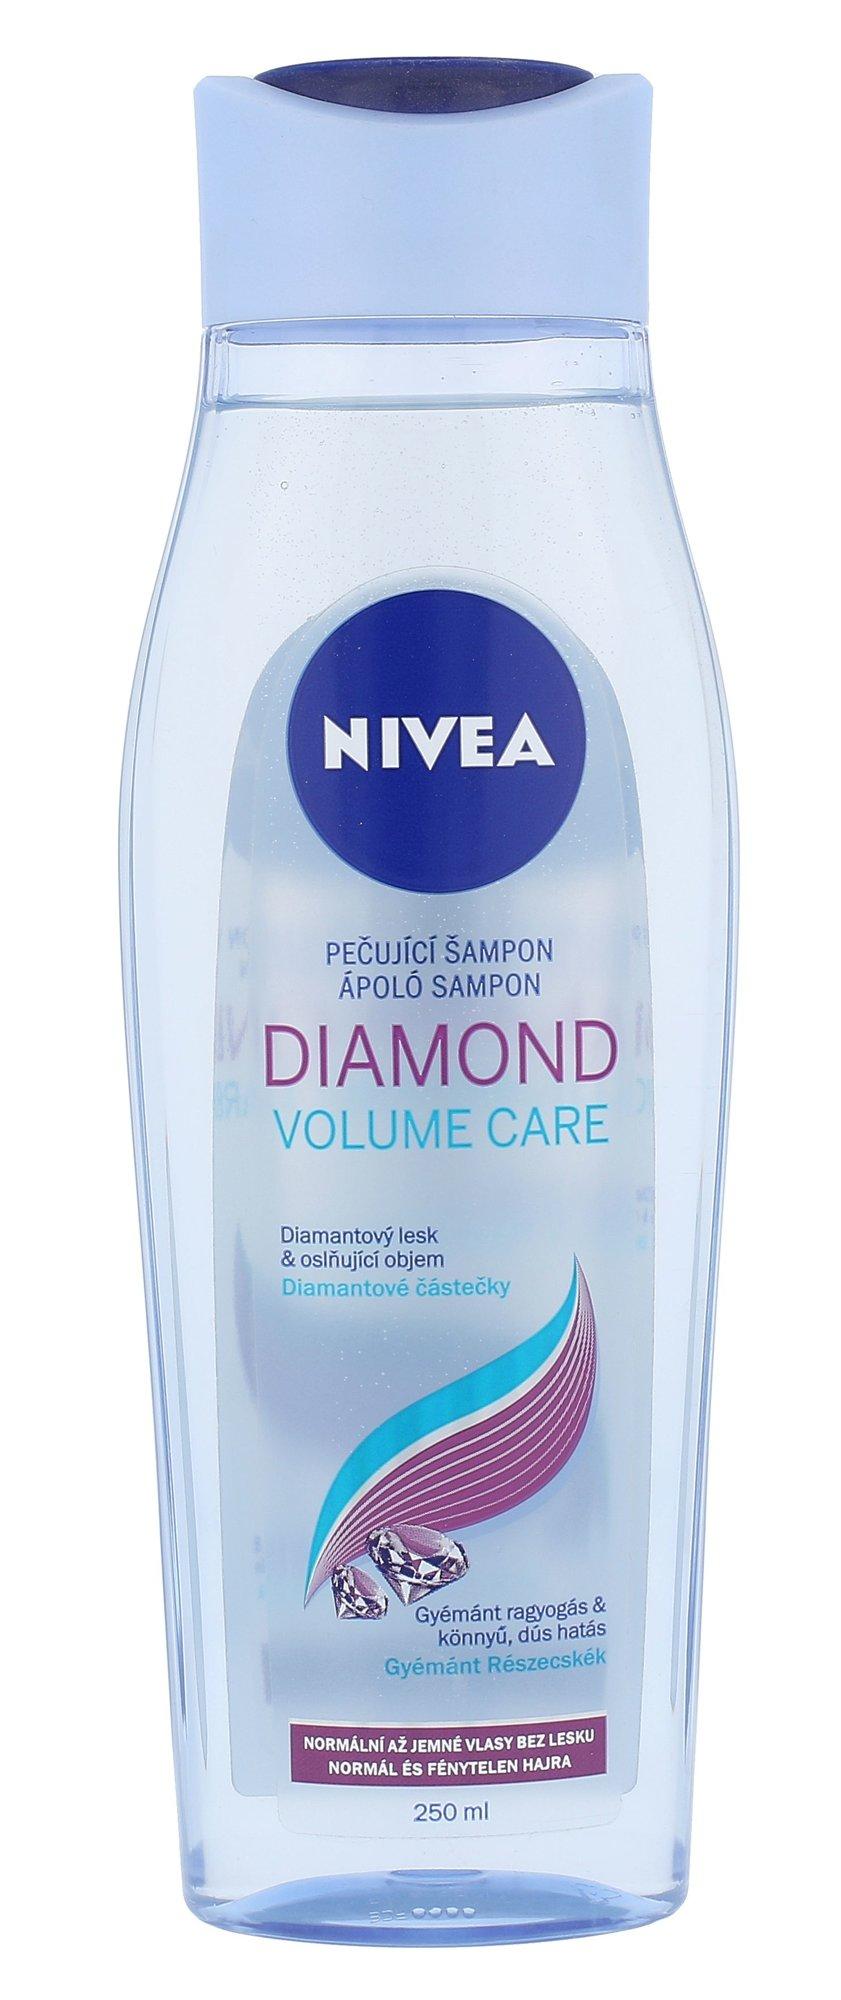 Nivea Diamond Volume Care Cosmetic 250ml